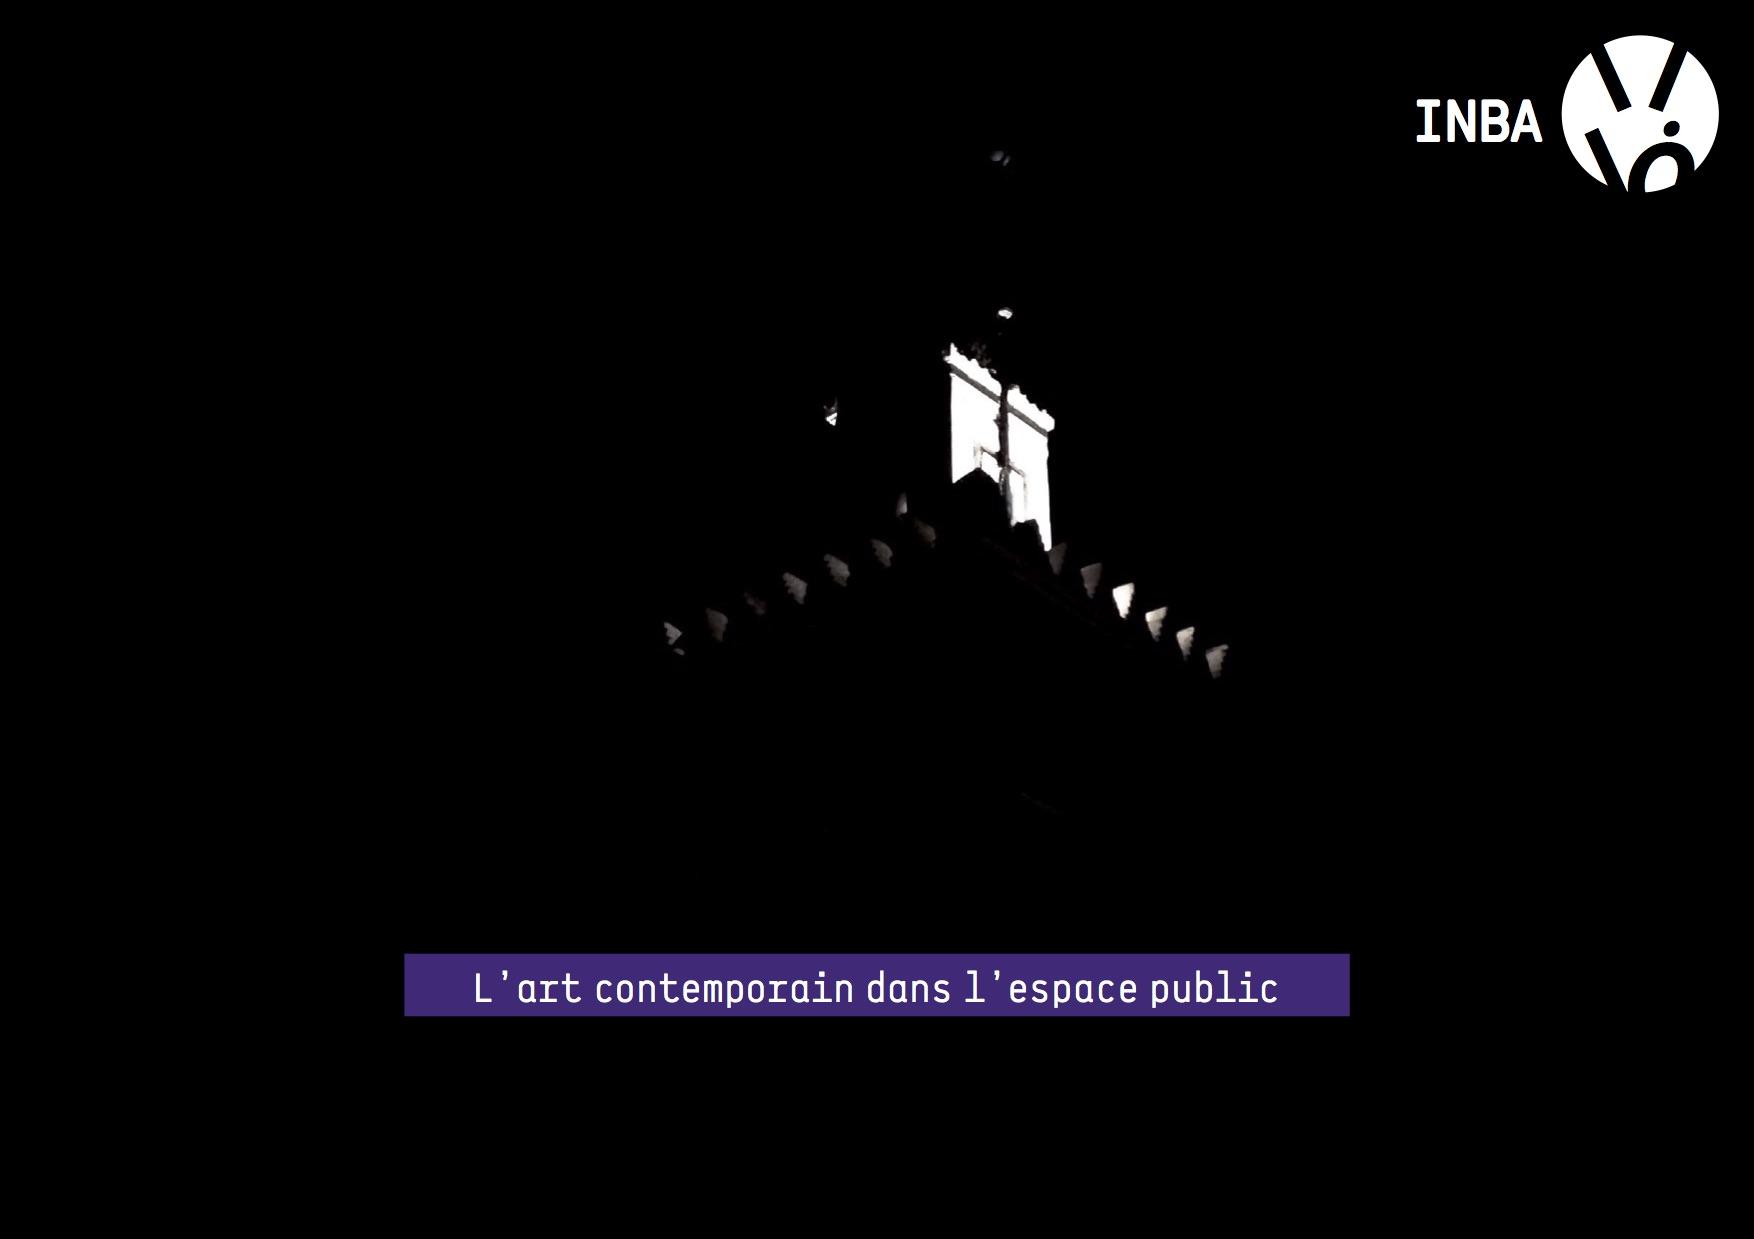 INBA FÉVRIER 2018 01.jpg